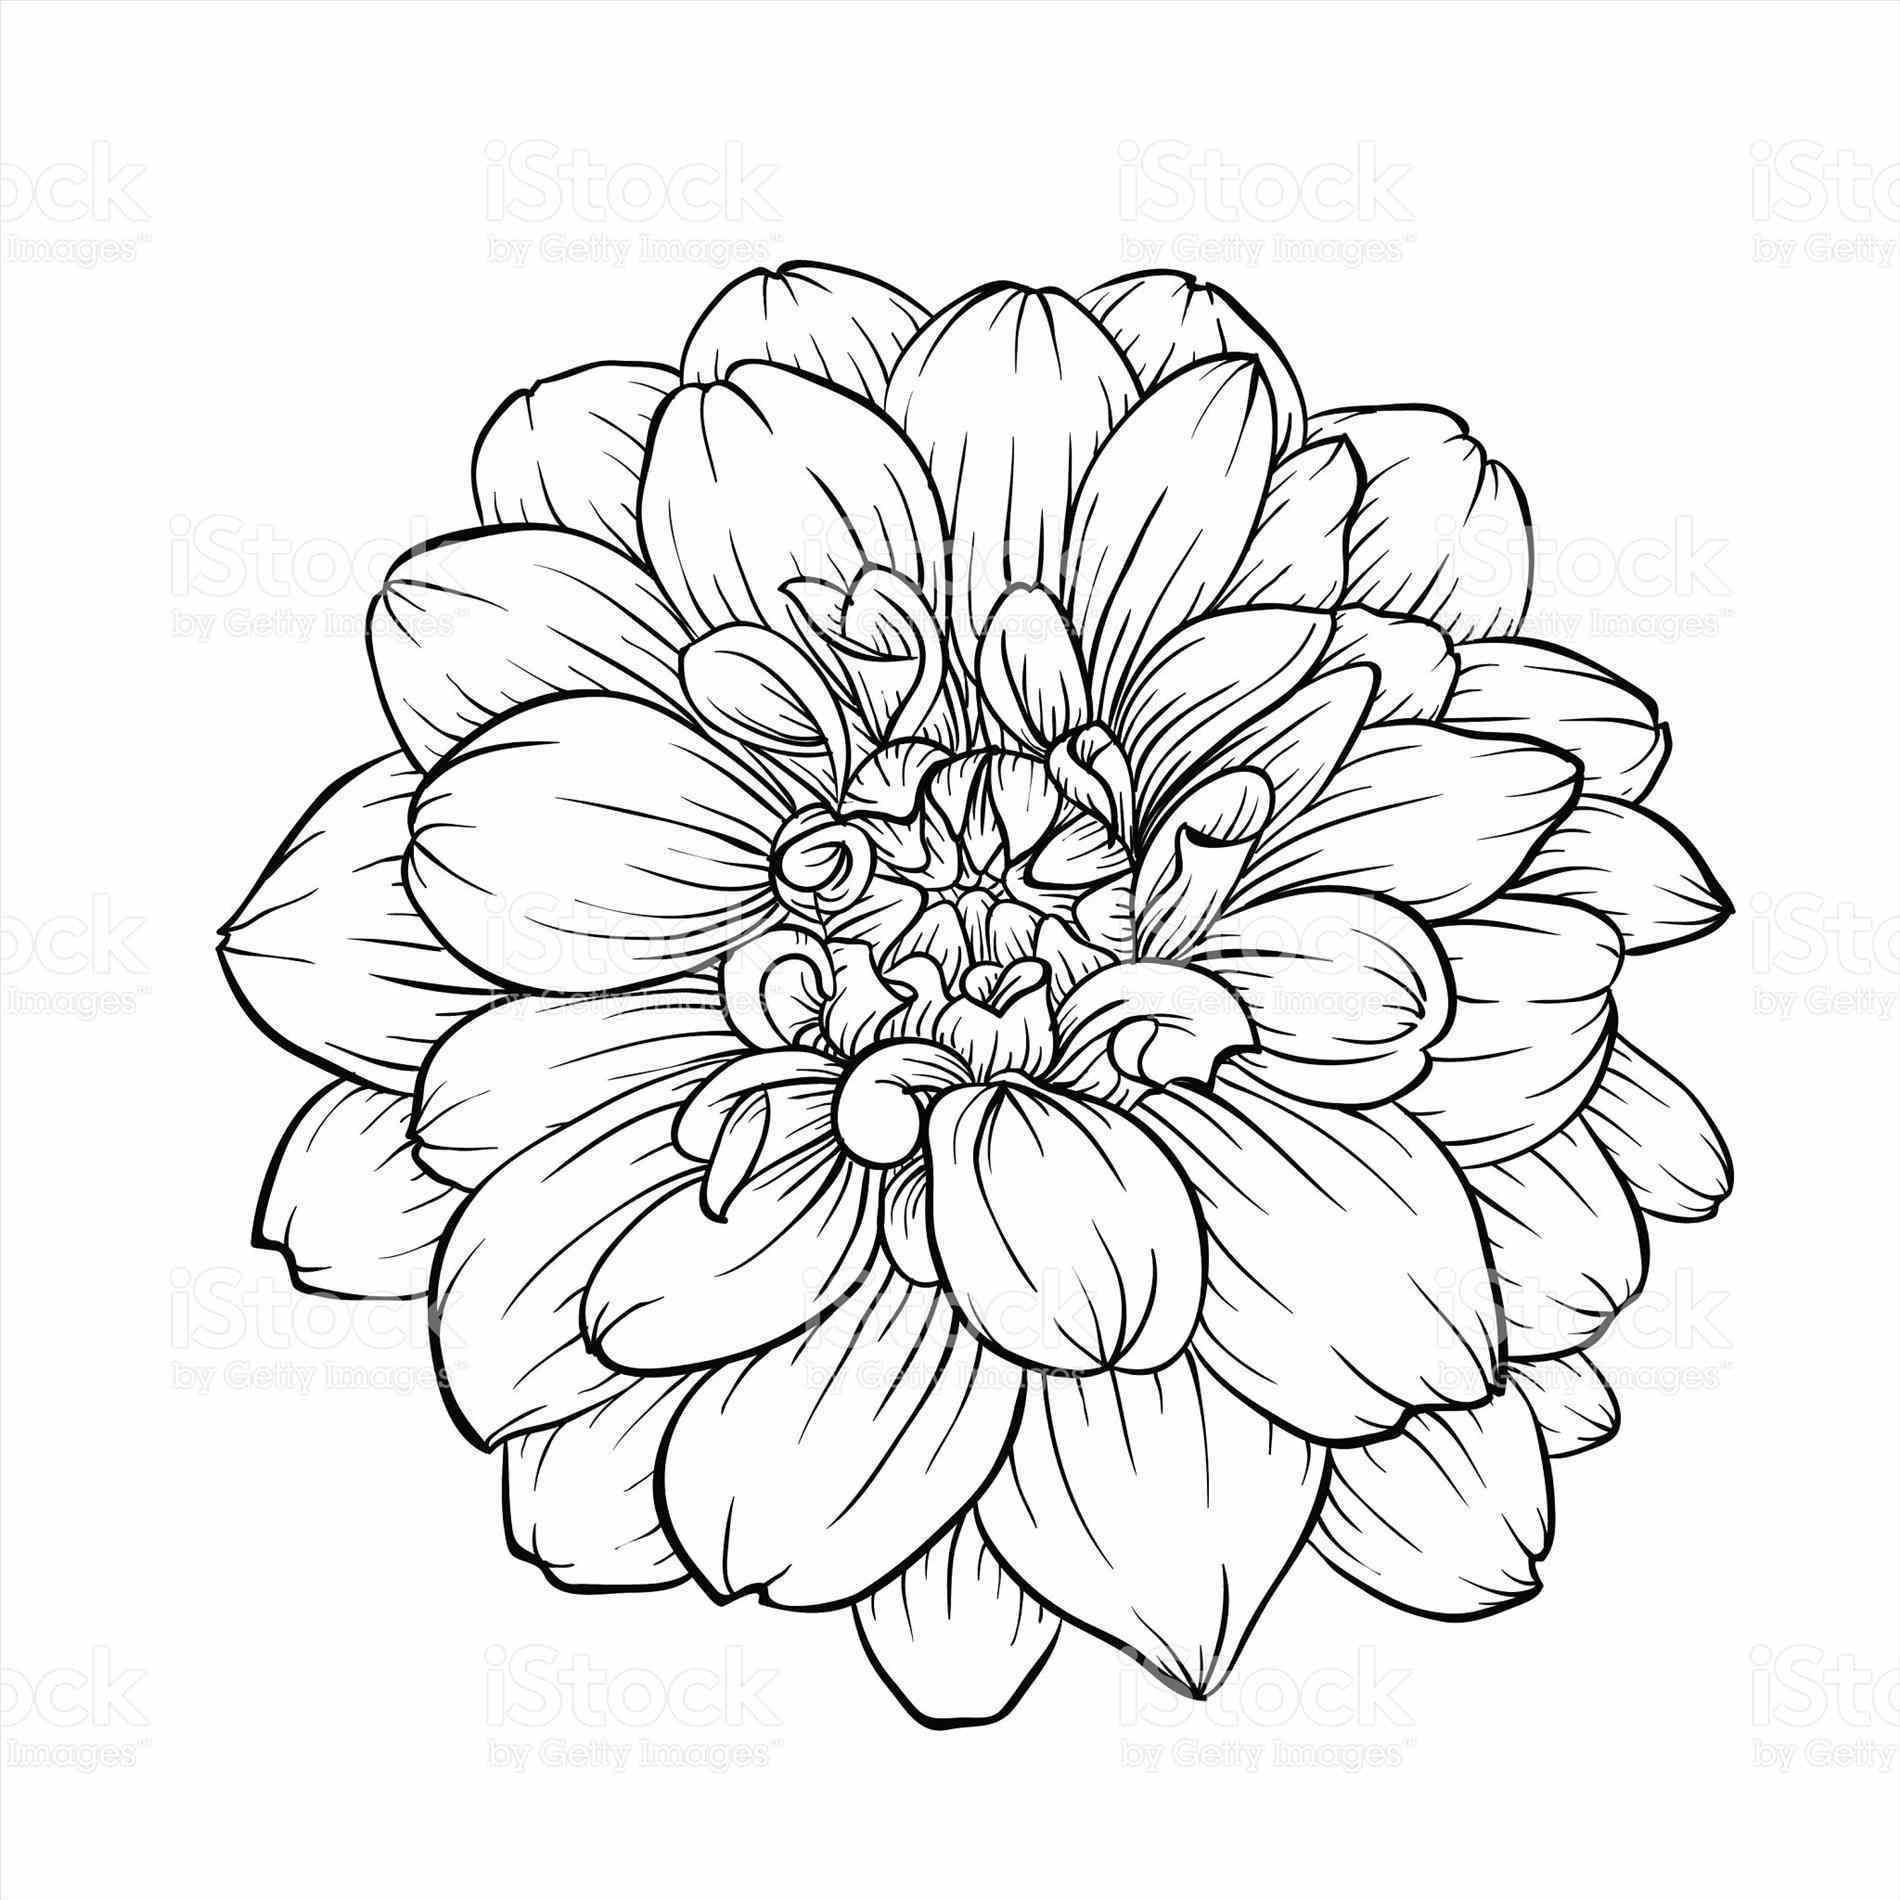 1900x1900 On Dongetrabi Rose Bouquet Tumblr Dongetrabi Black And White